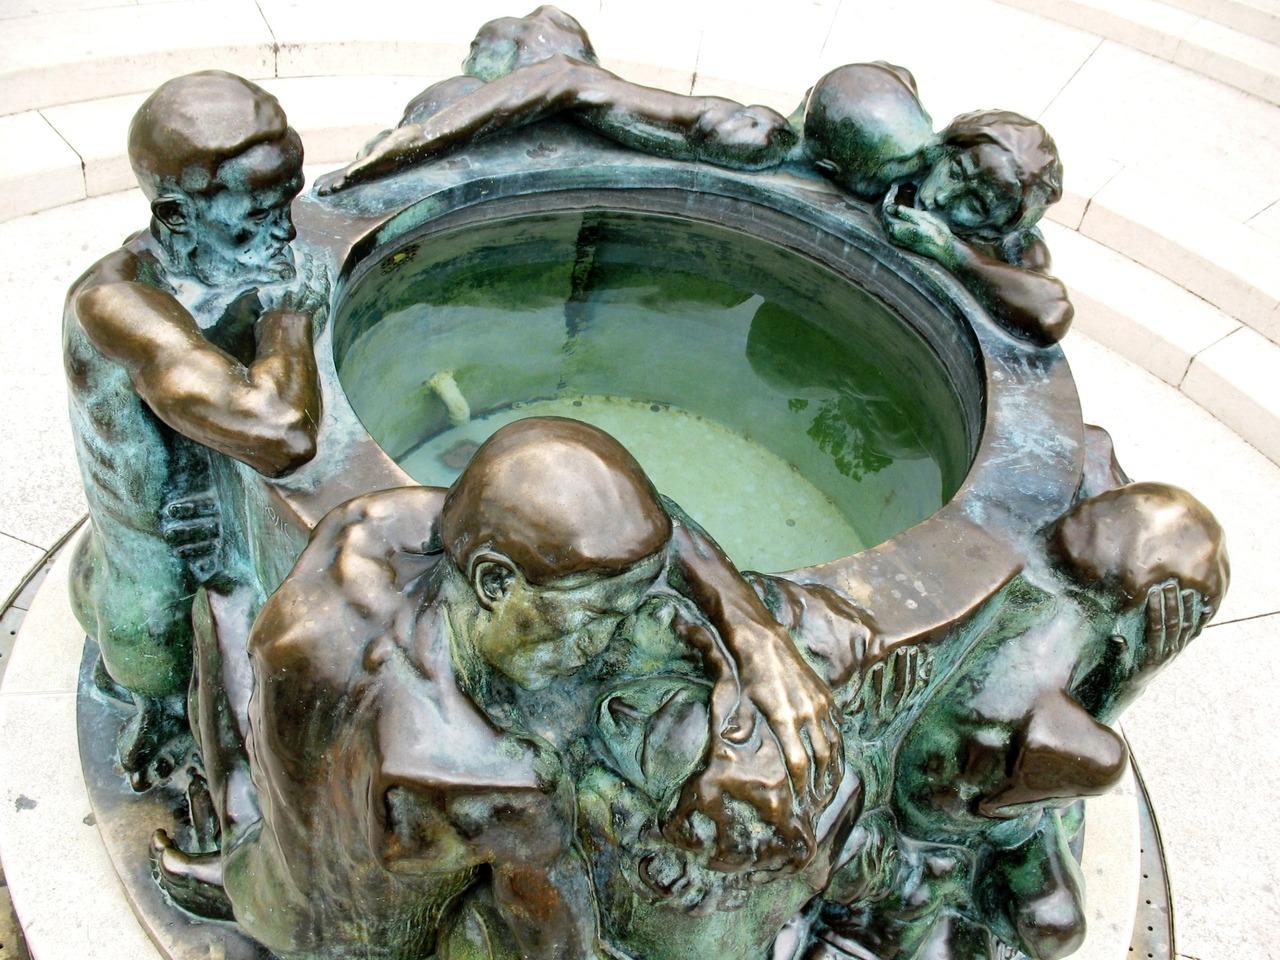 Zagrebački spomenici, skulpture, biste Tumblr_l3947zWPfi1qzohrco1_1280